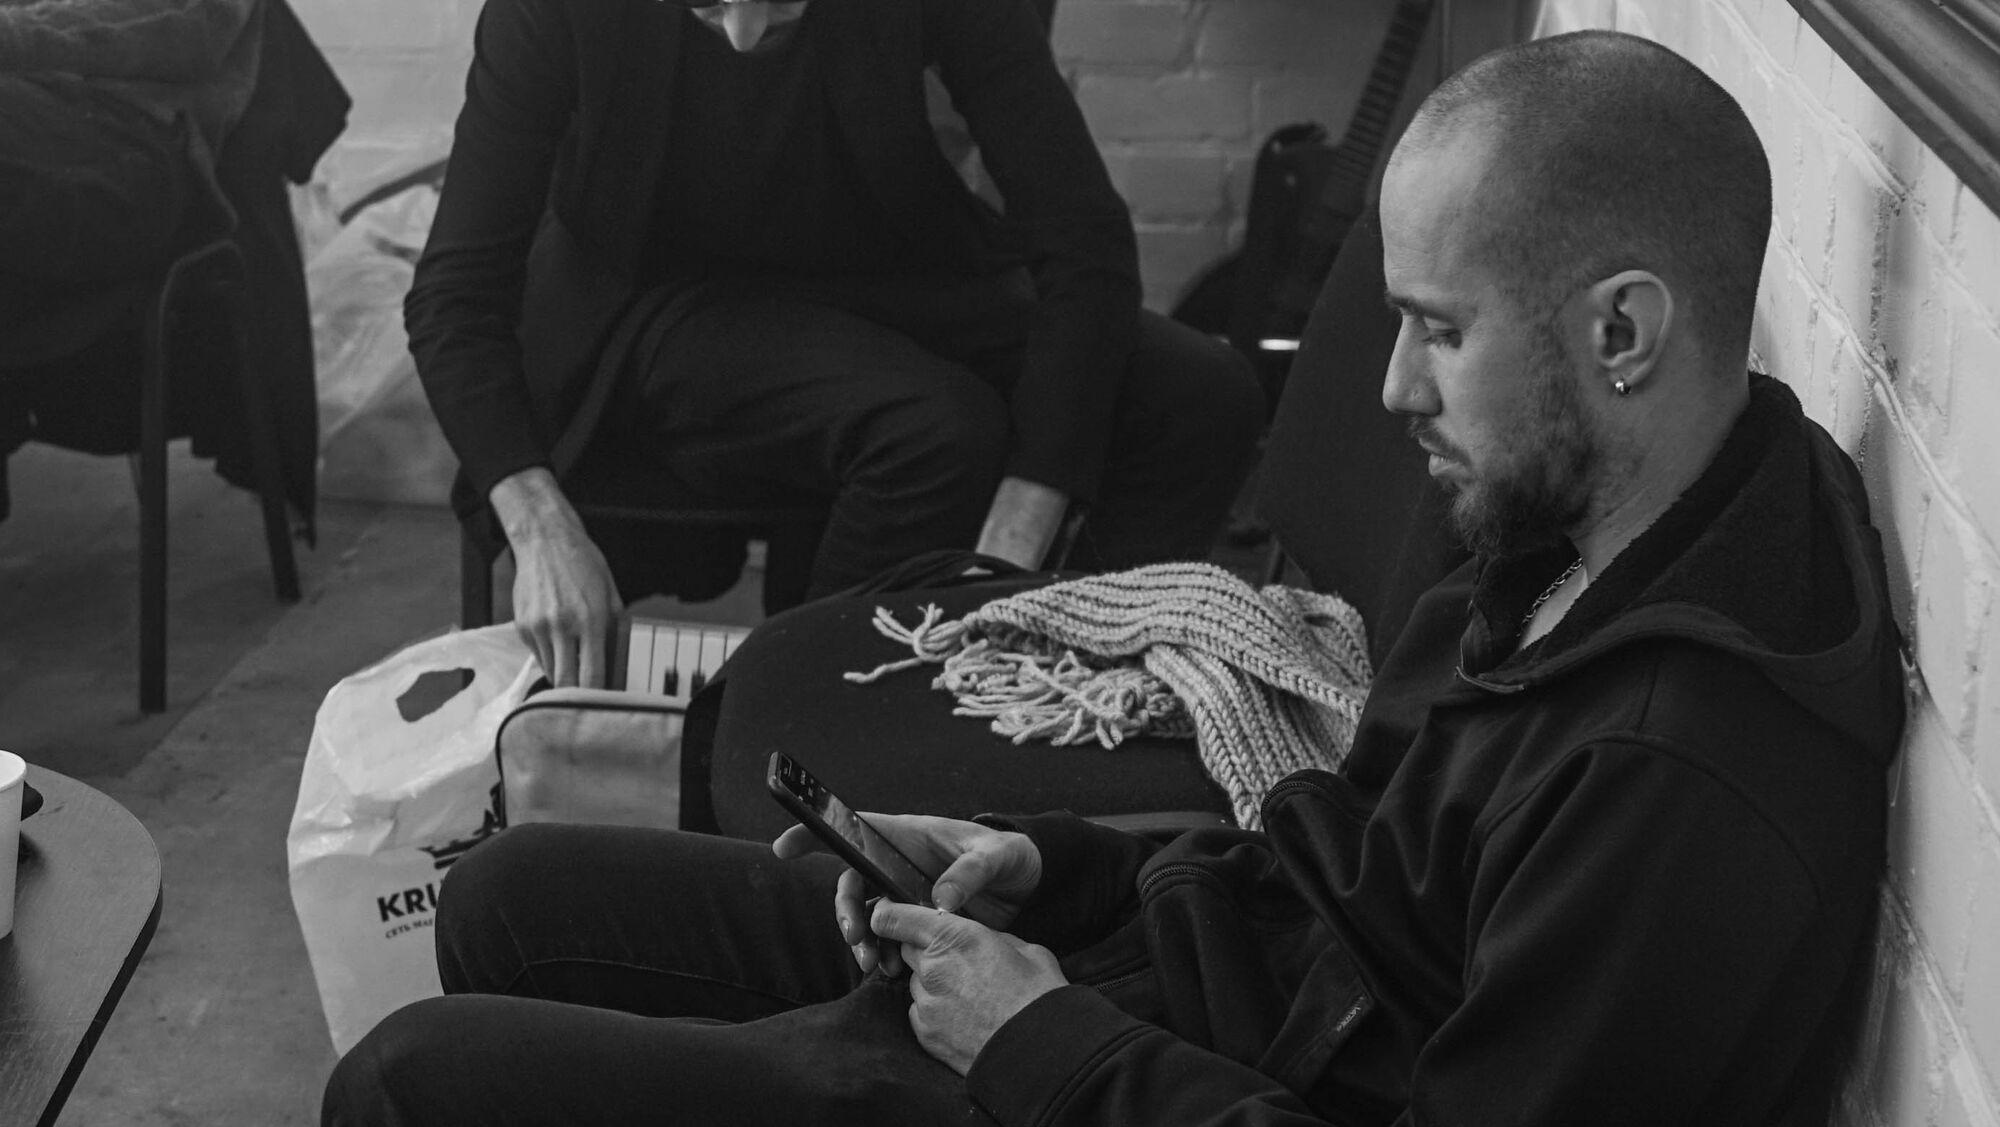 Сыграют со светом: O.Torvald показали яркие фото со съемок нового клипа